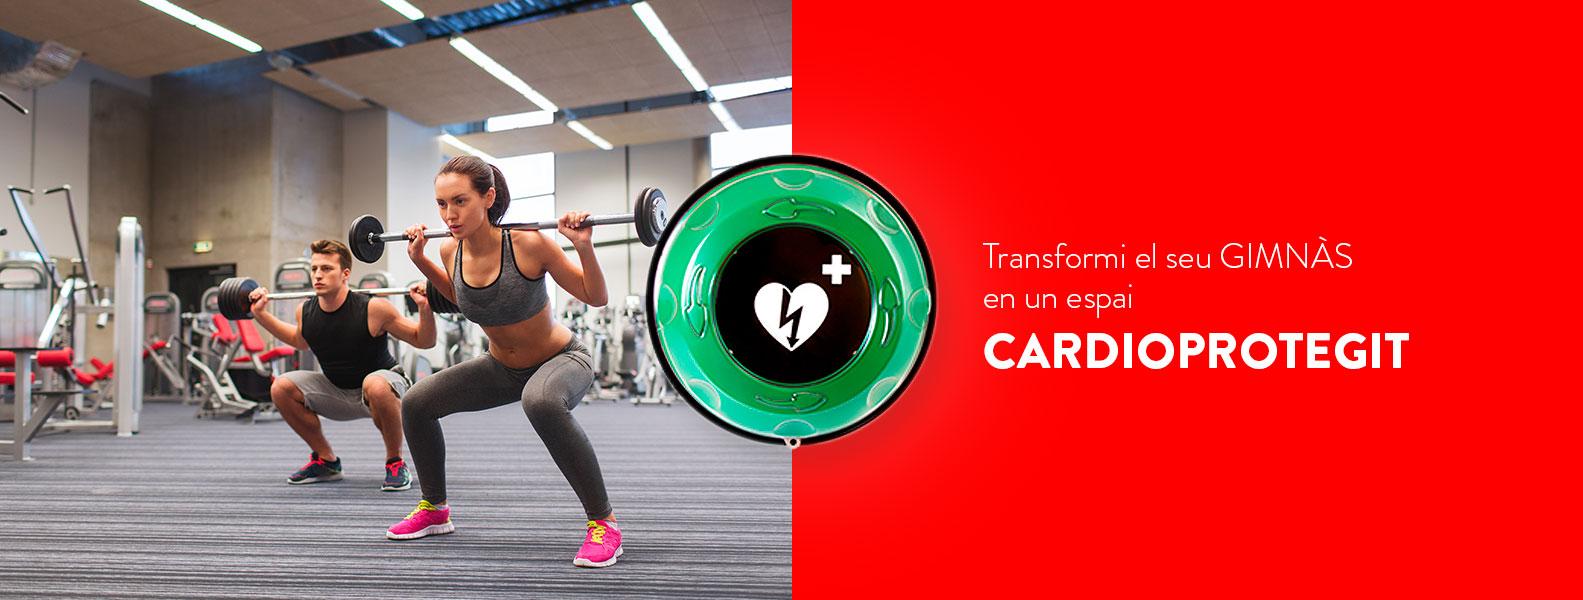 slides_cardiopas__gimnasio_cat